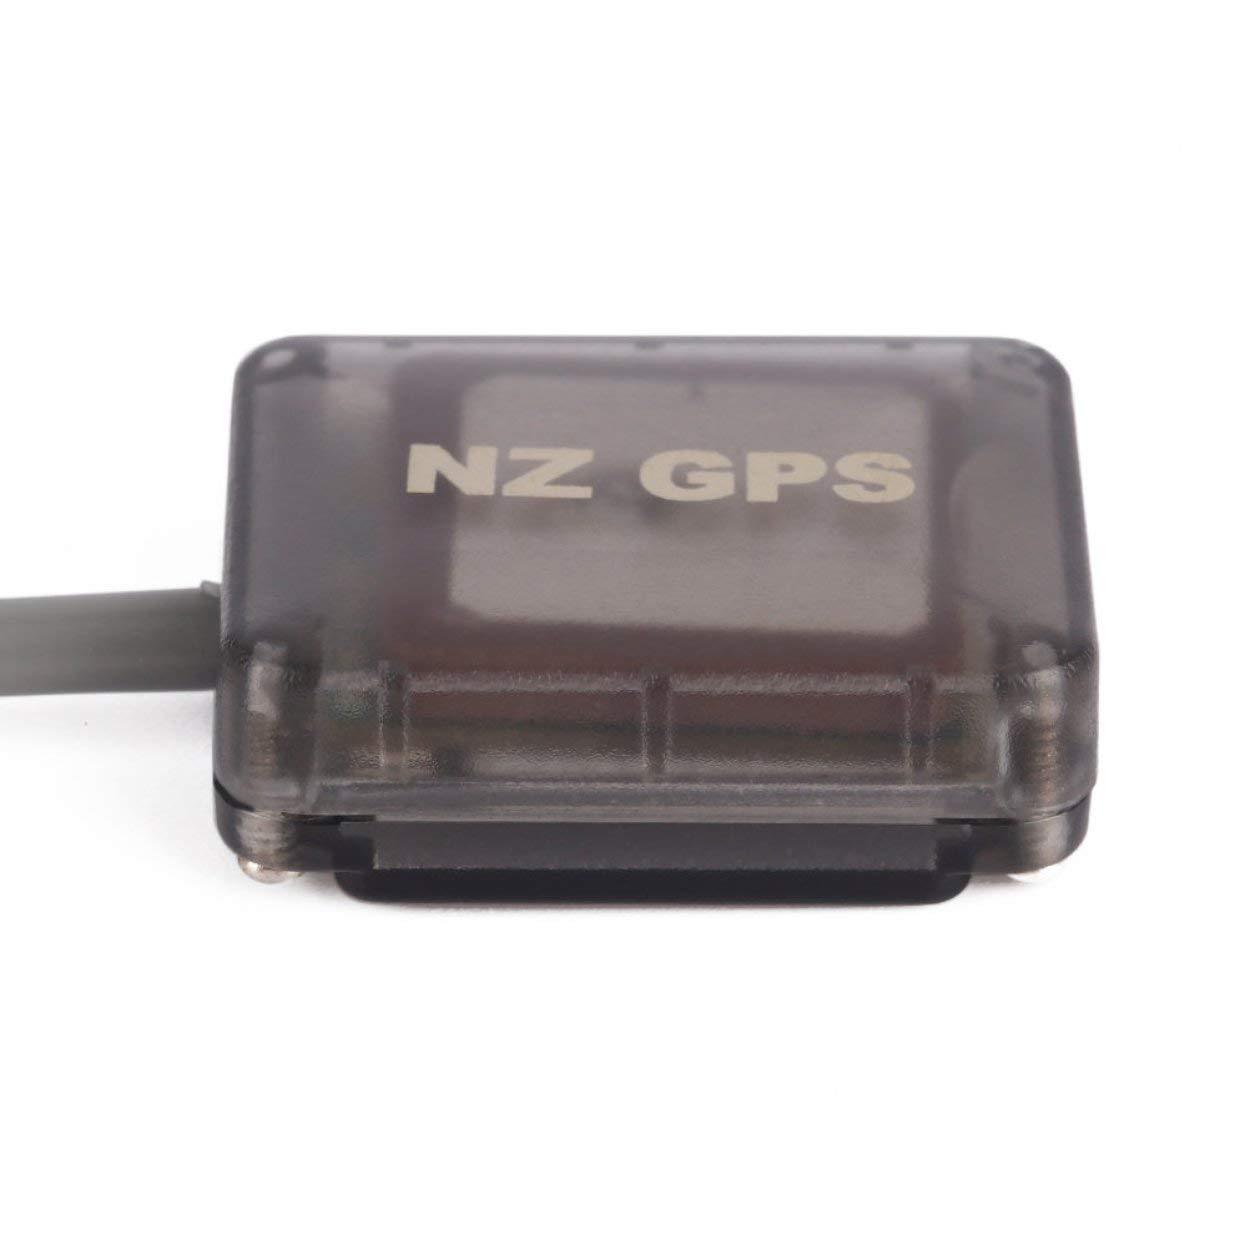 HONGIRT OCDAY 7 Chip Core OP GPS per Openpilot NAZE32 Colore: Grigio F3 Flight Controller